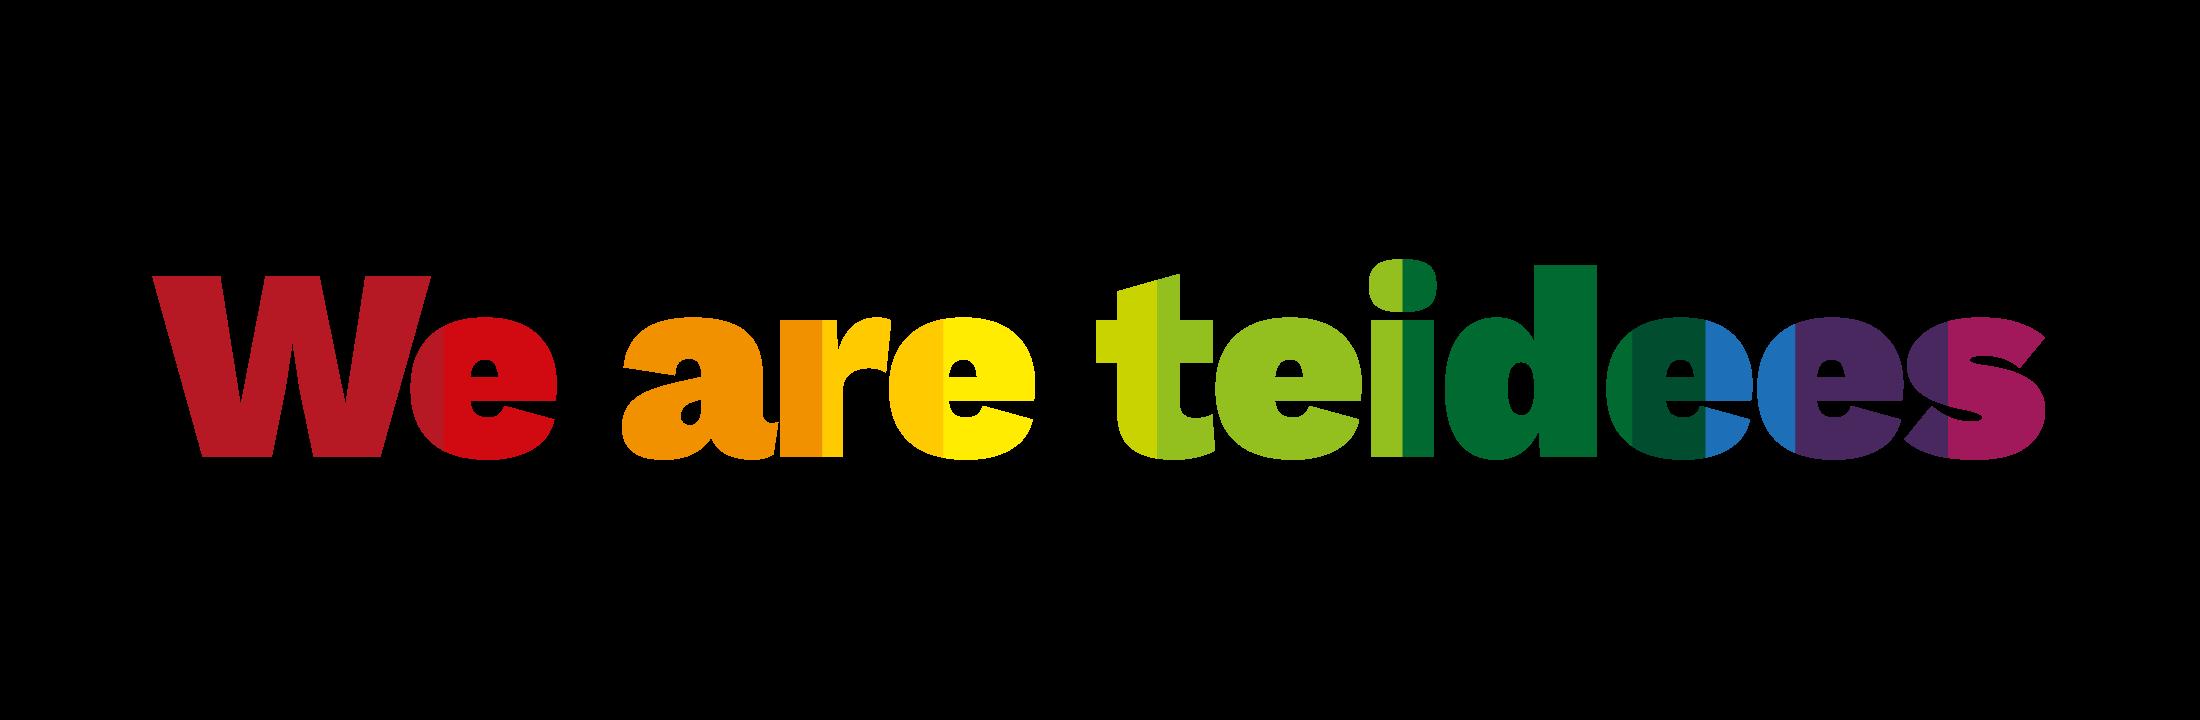 We are Teidees Audiovisuals